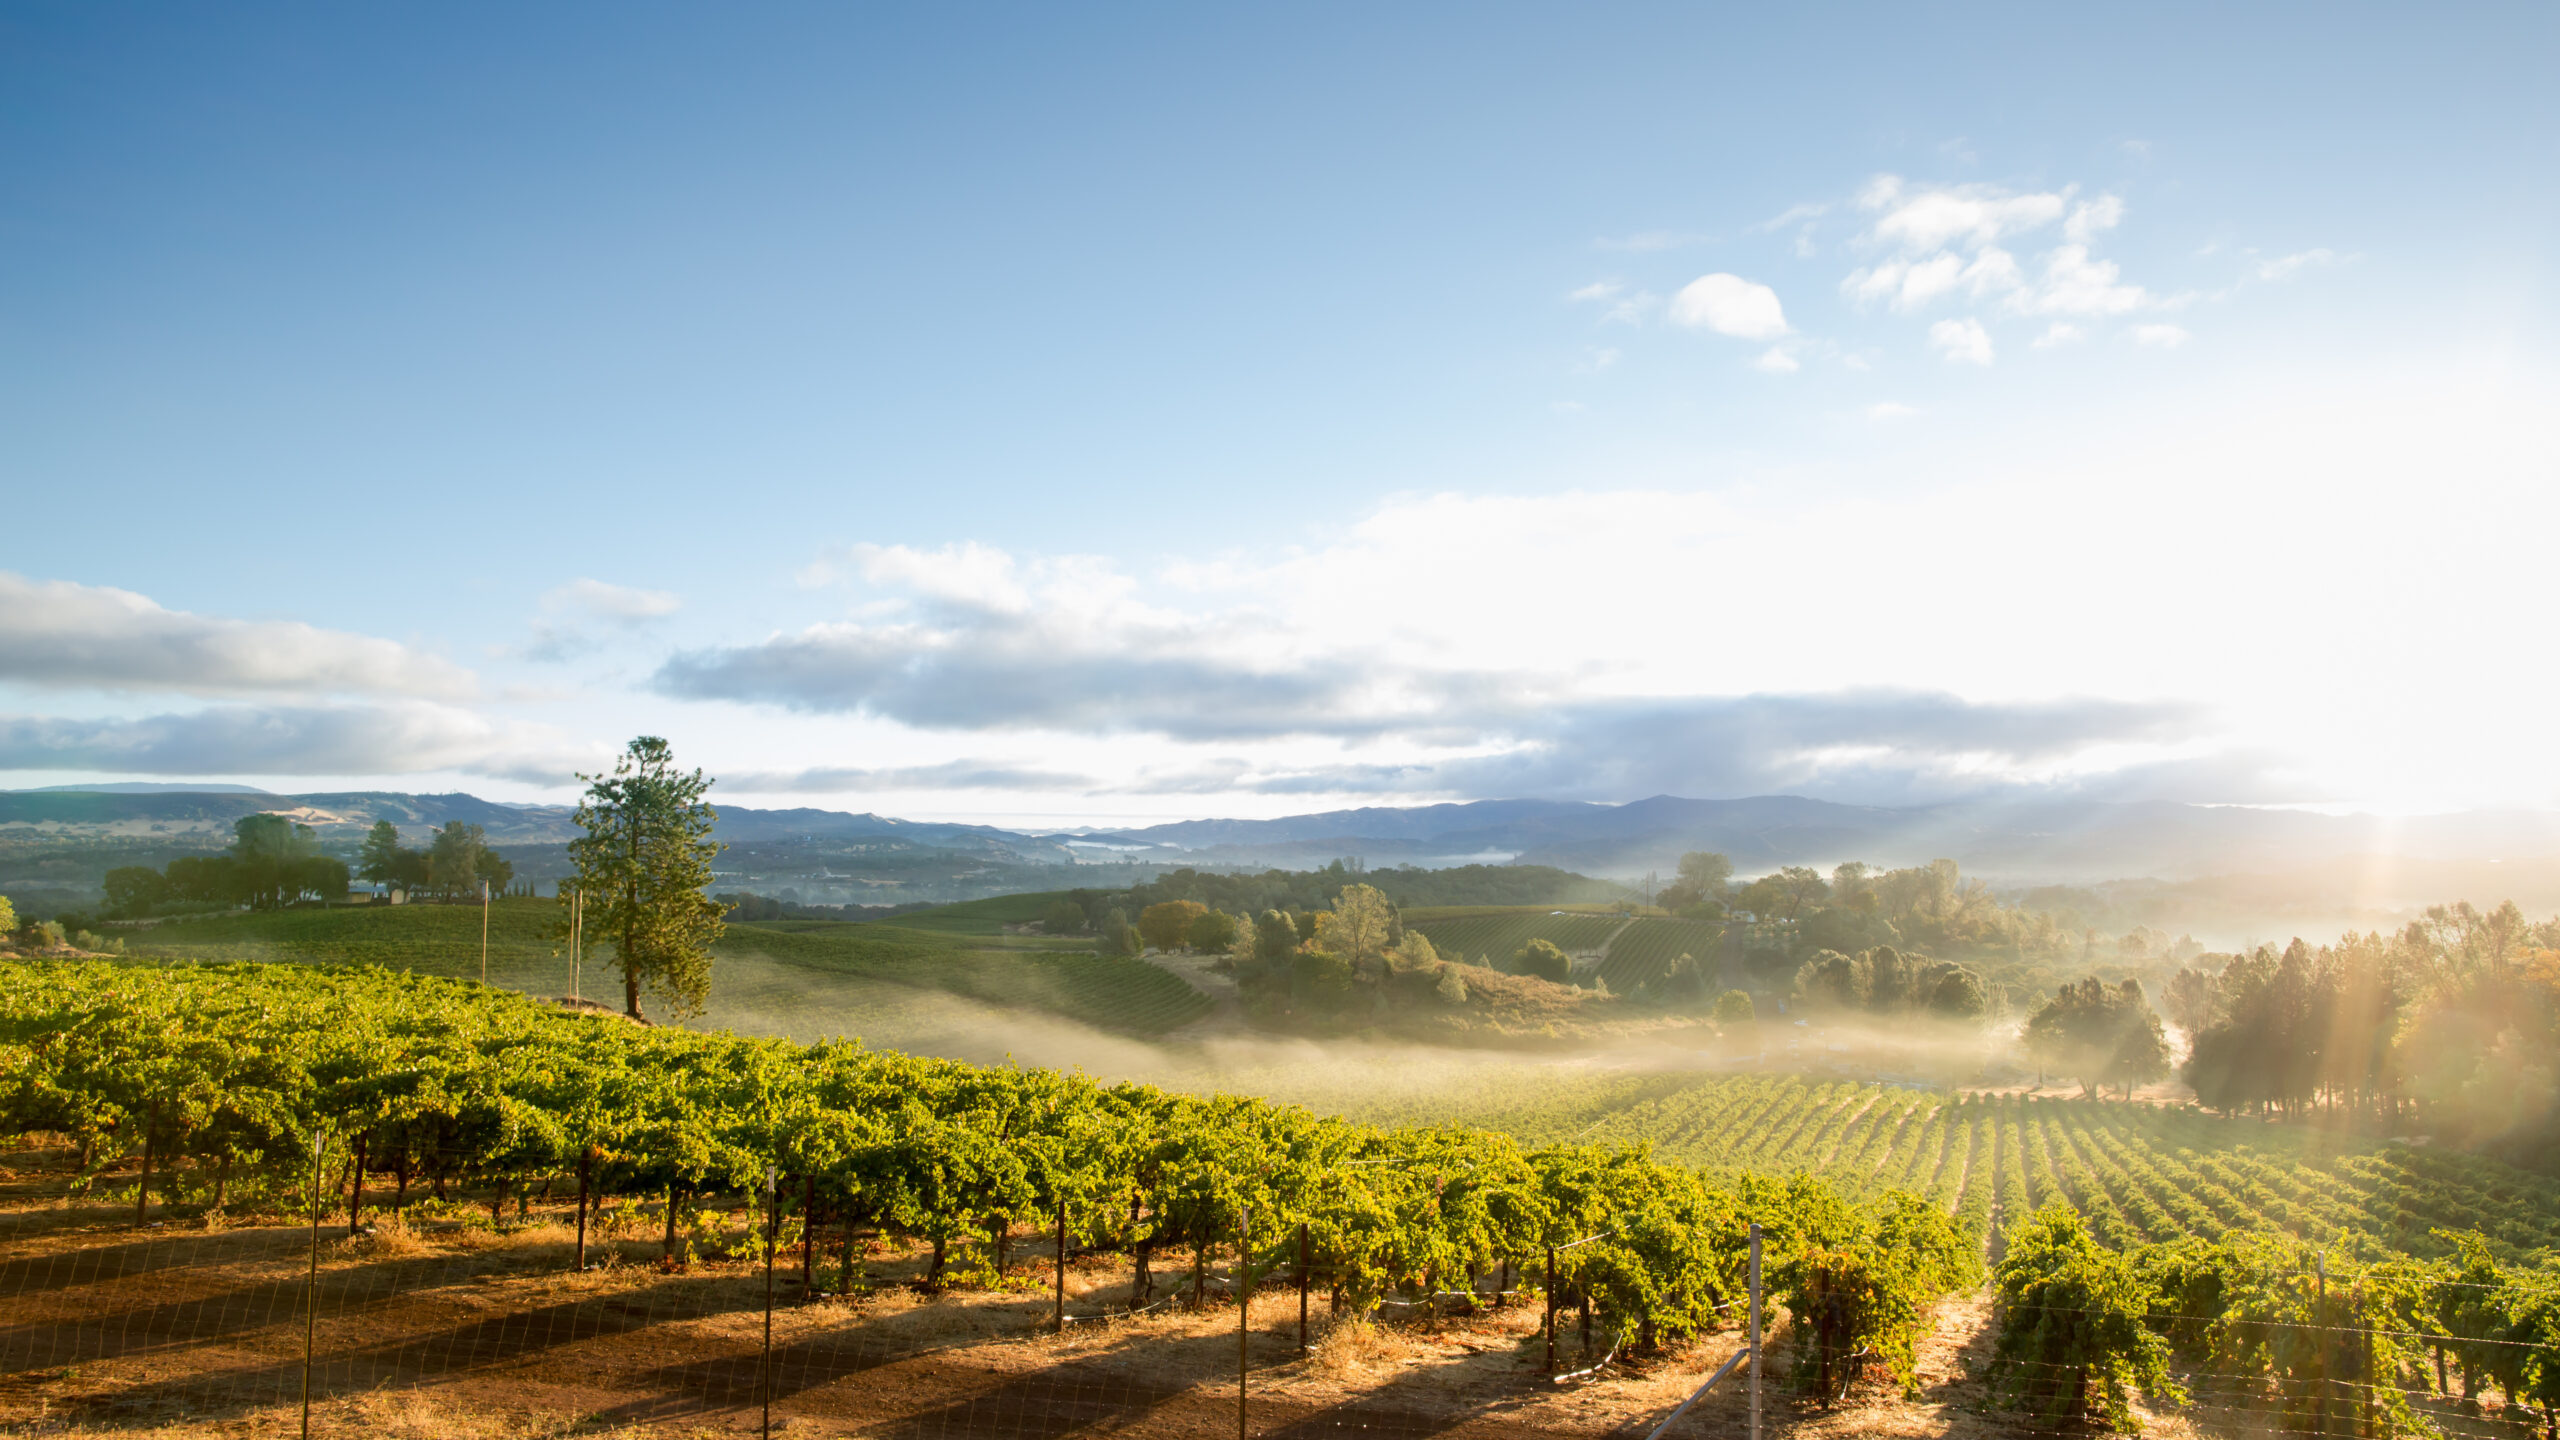 vinogradnik-colifornia-wineyard